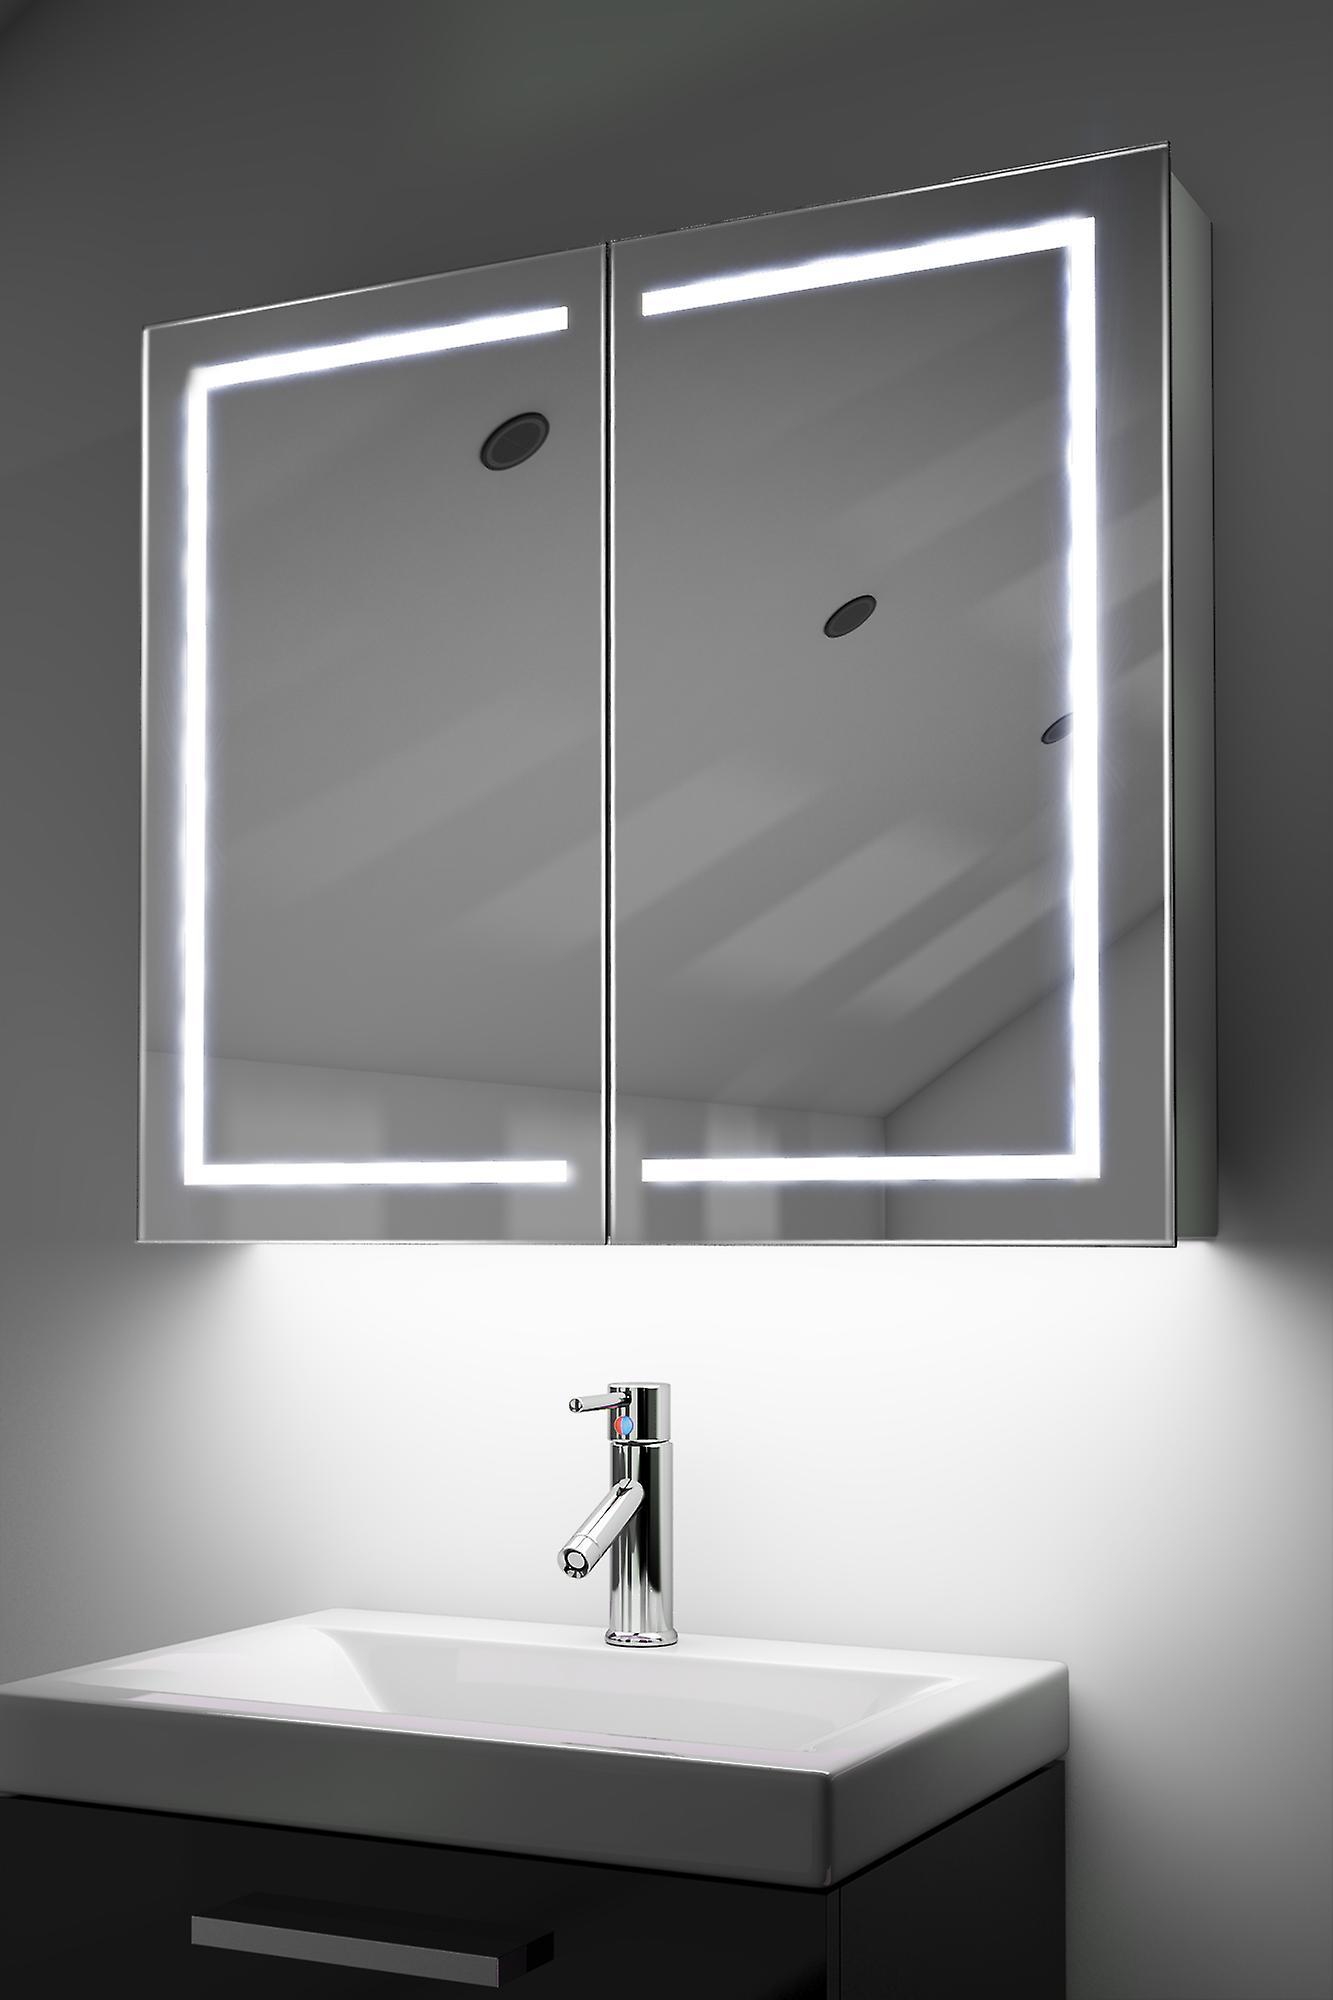 Demist Cabinet With RGB , Sensor & Internal Shaver k368rgb